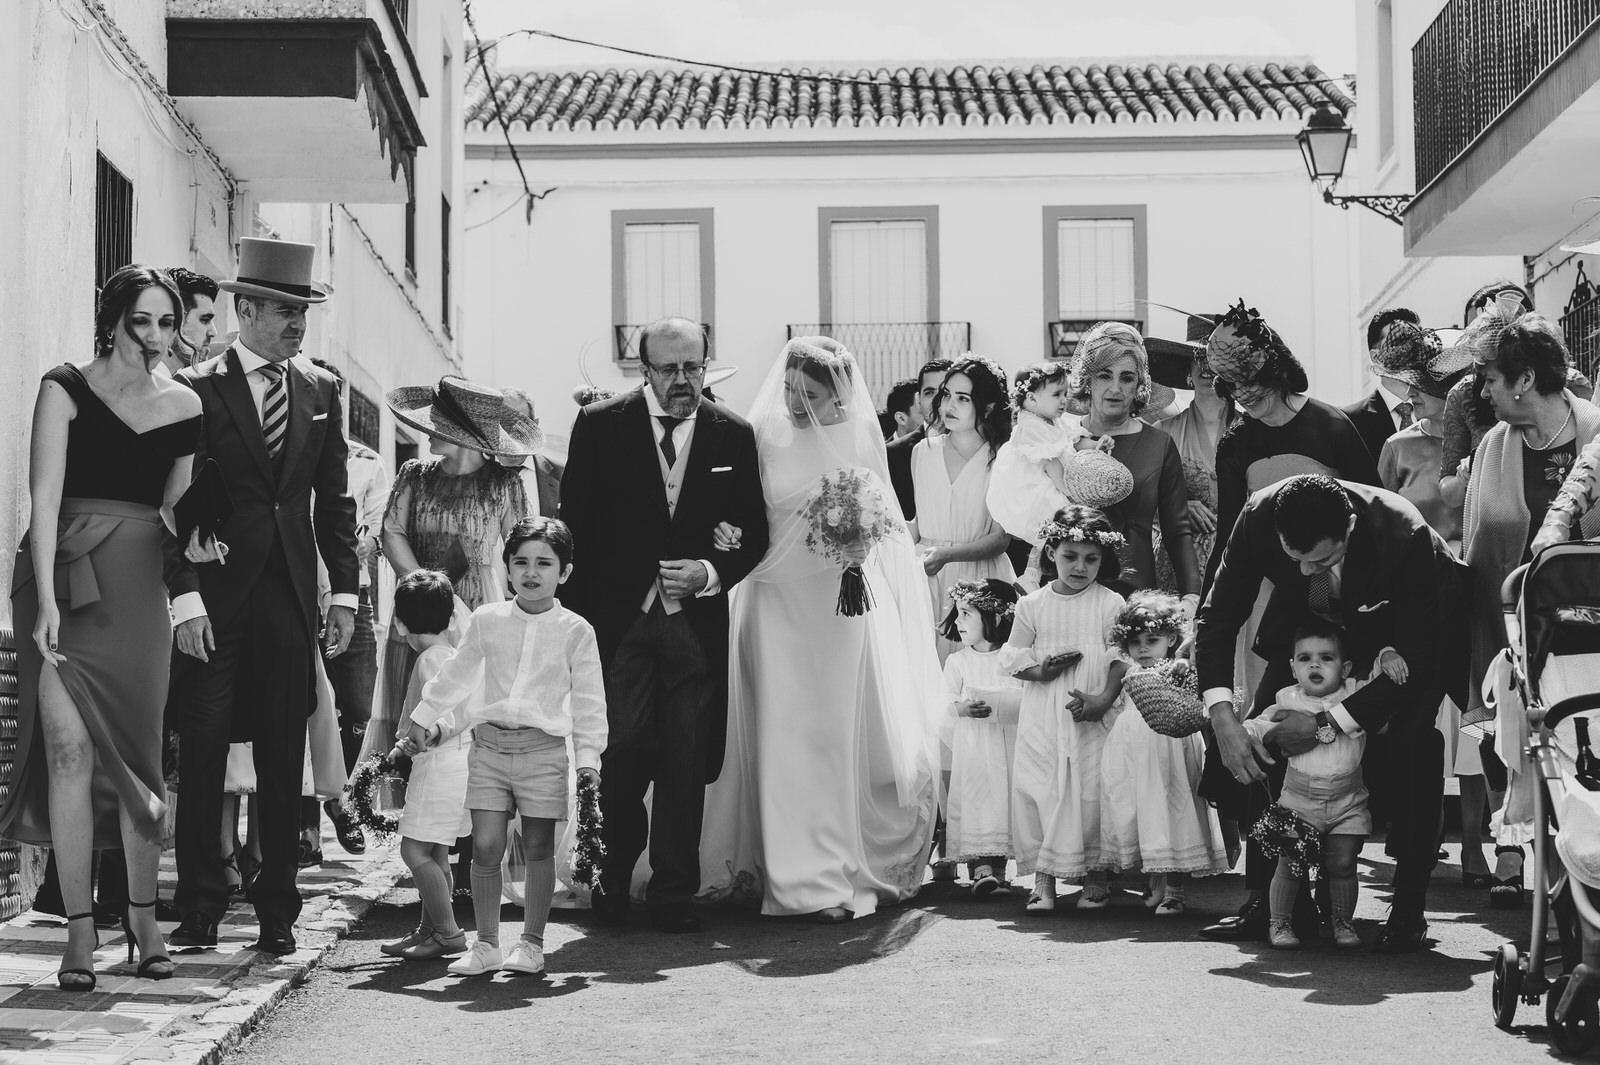 Judith & Gabriel - Boda en Olivares - Albaida, Fotógrafo de boda Andrés Amarillo - 21.JPG